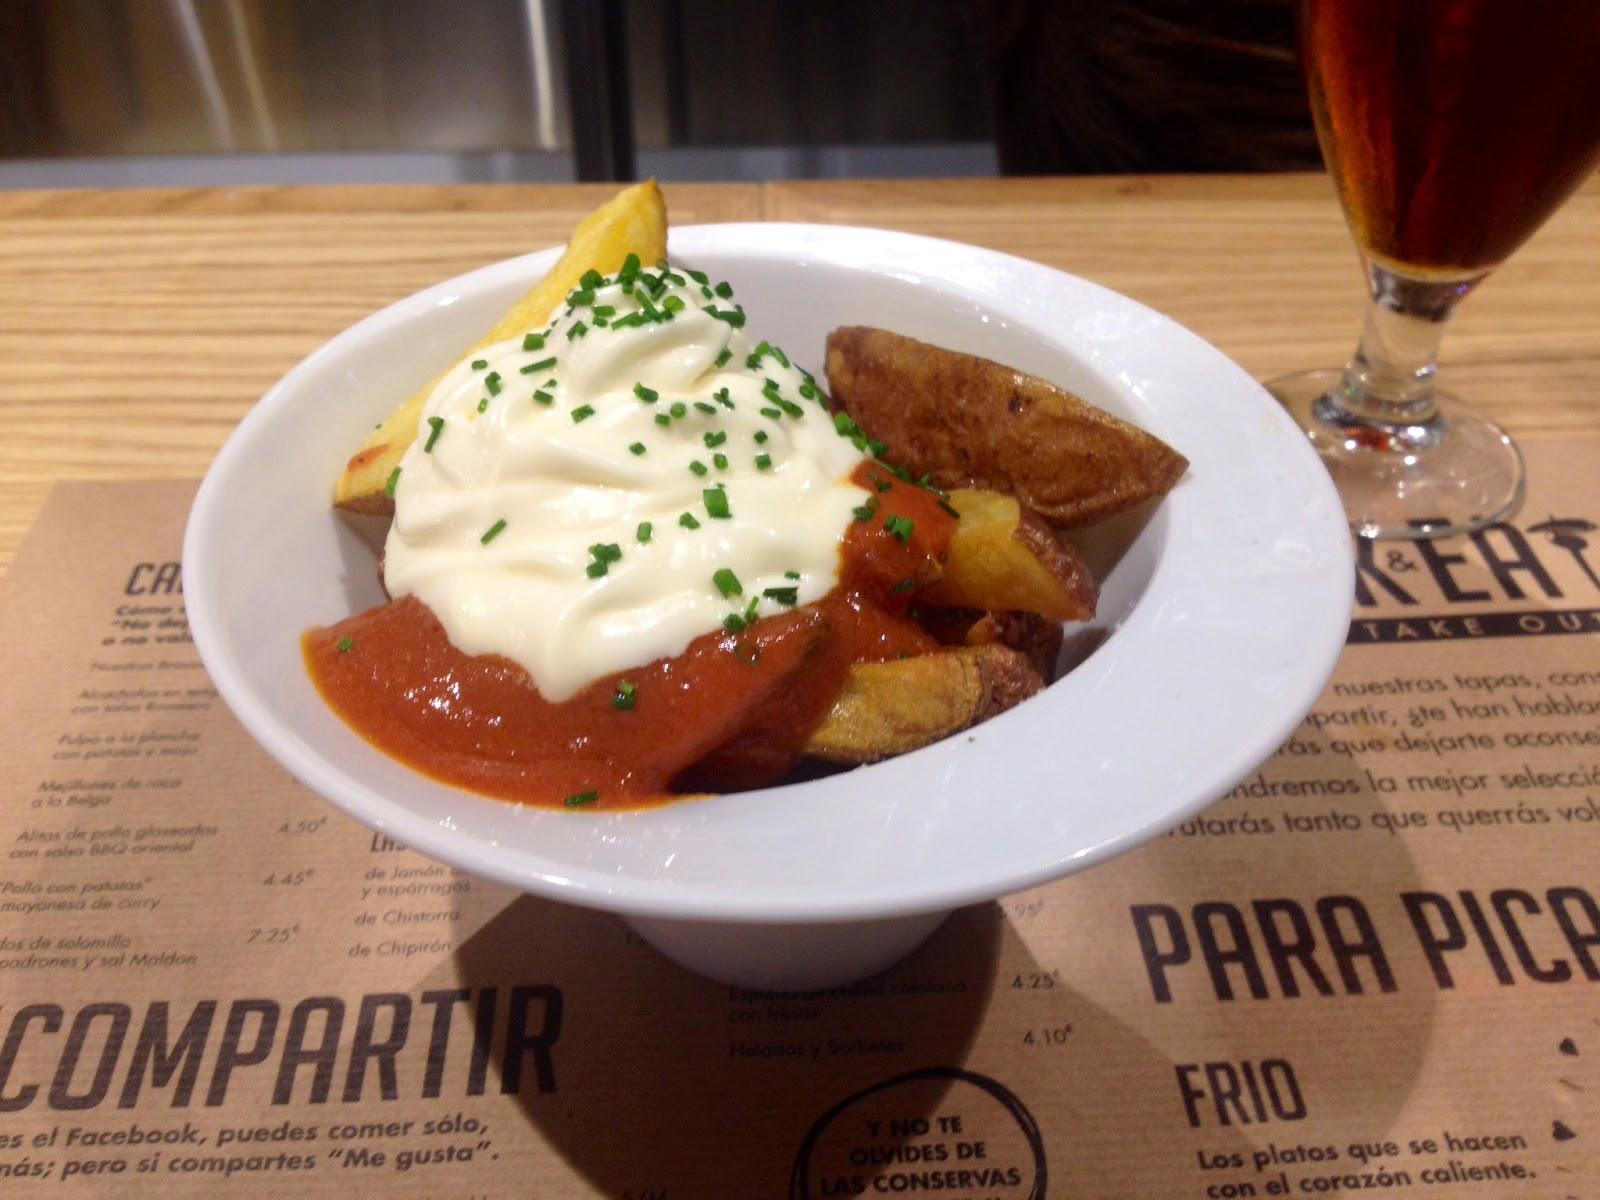 patatas bravas drink and eat